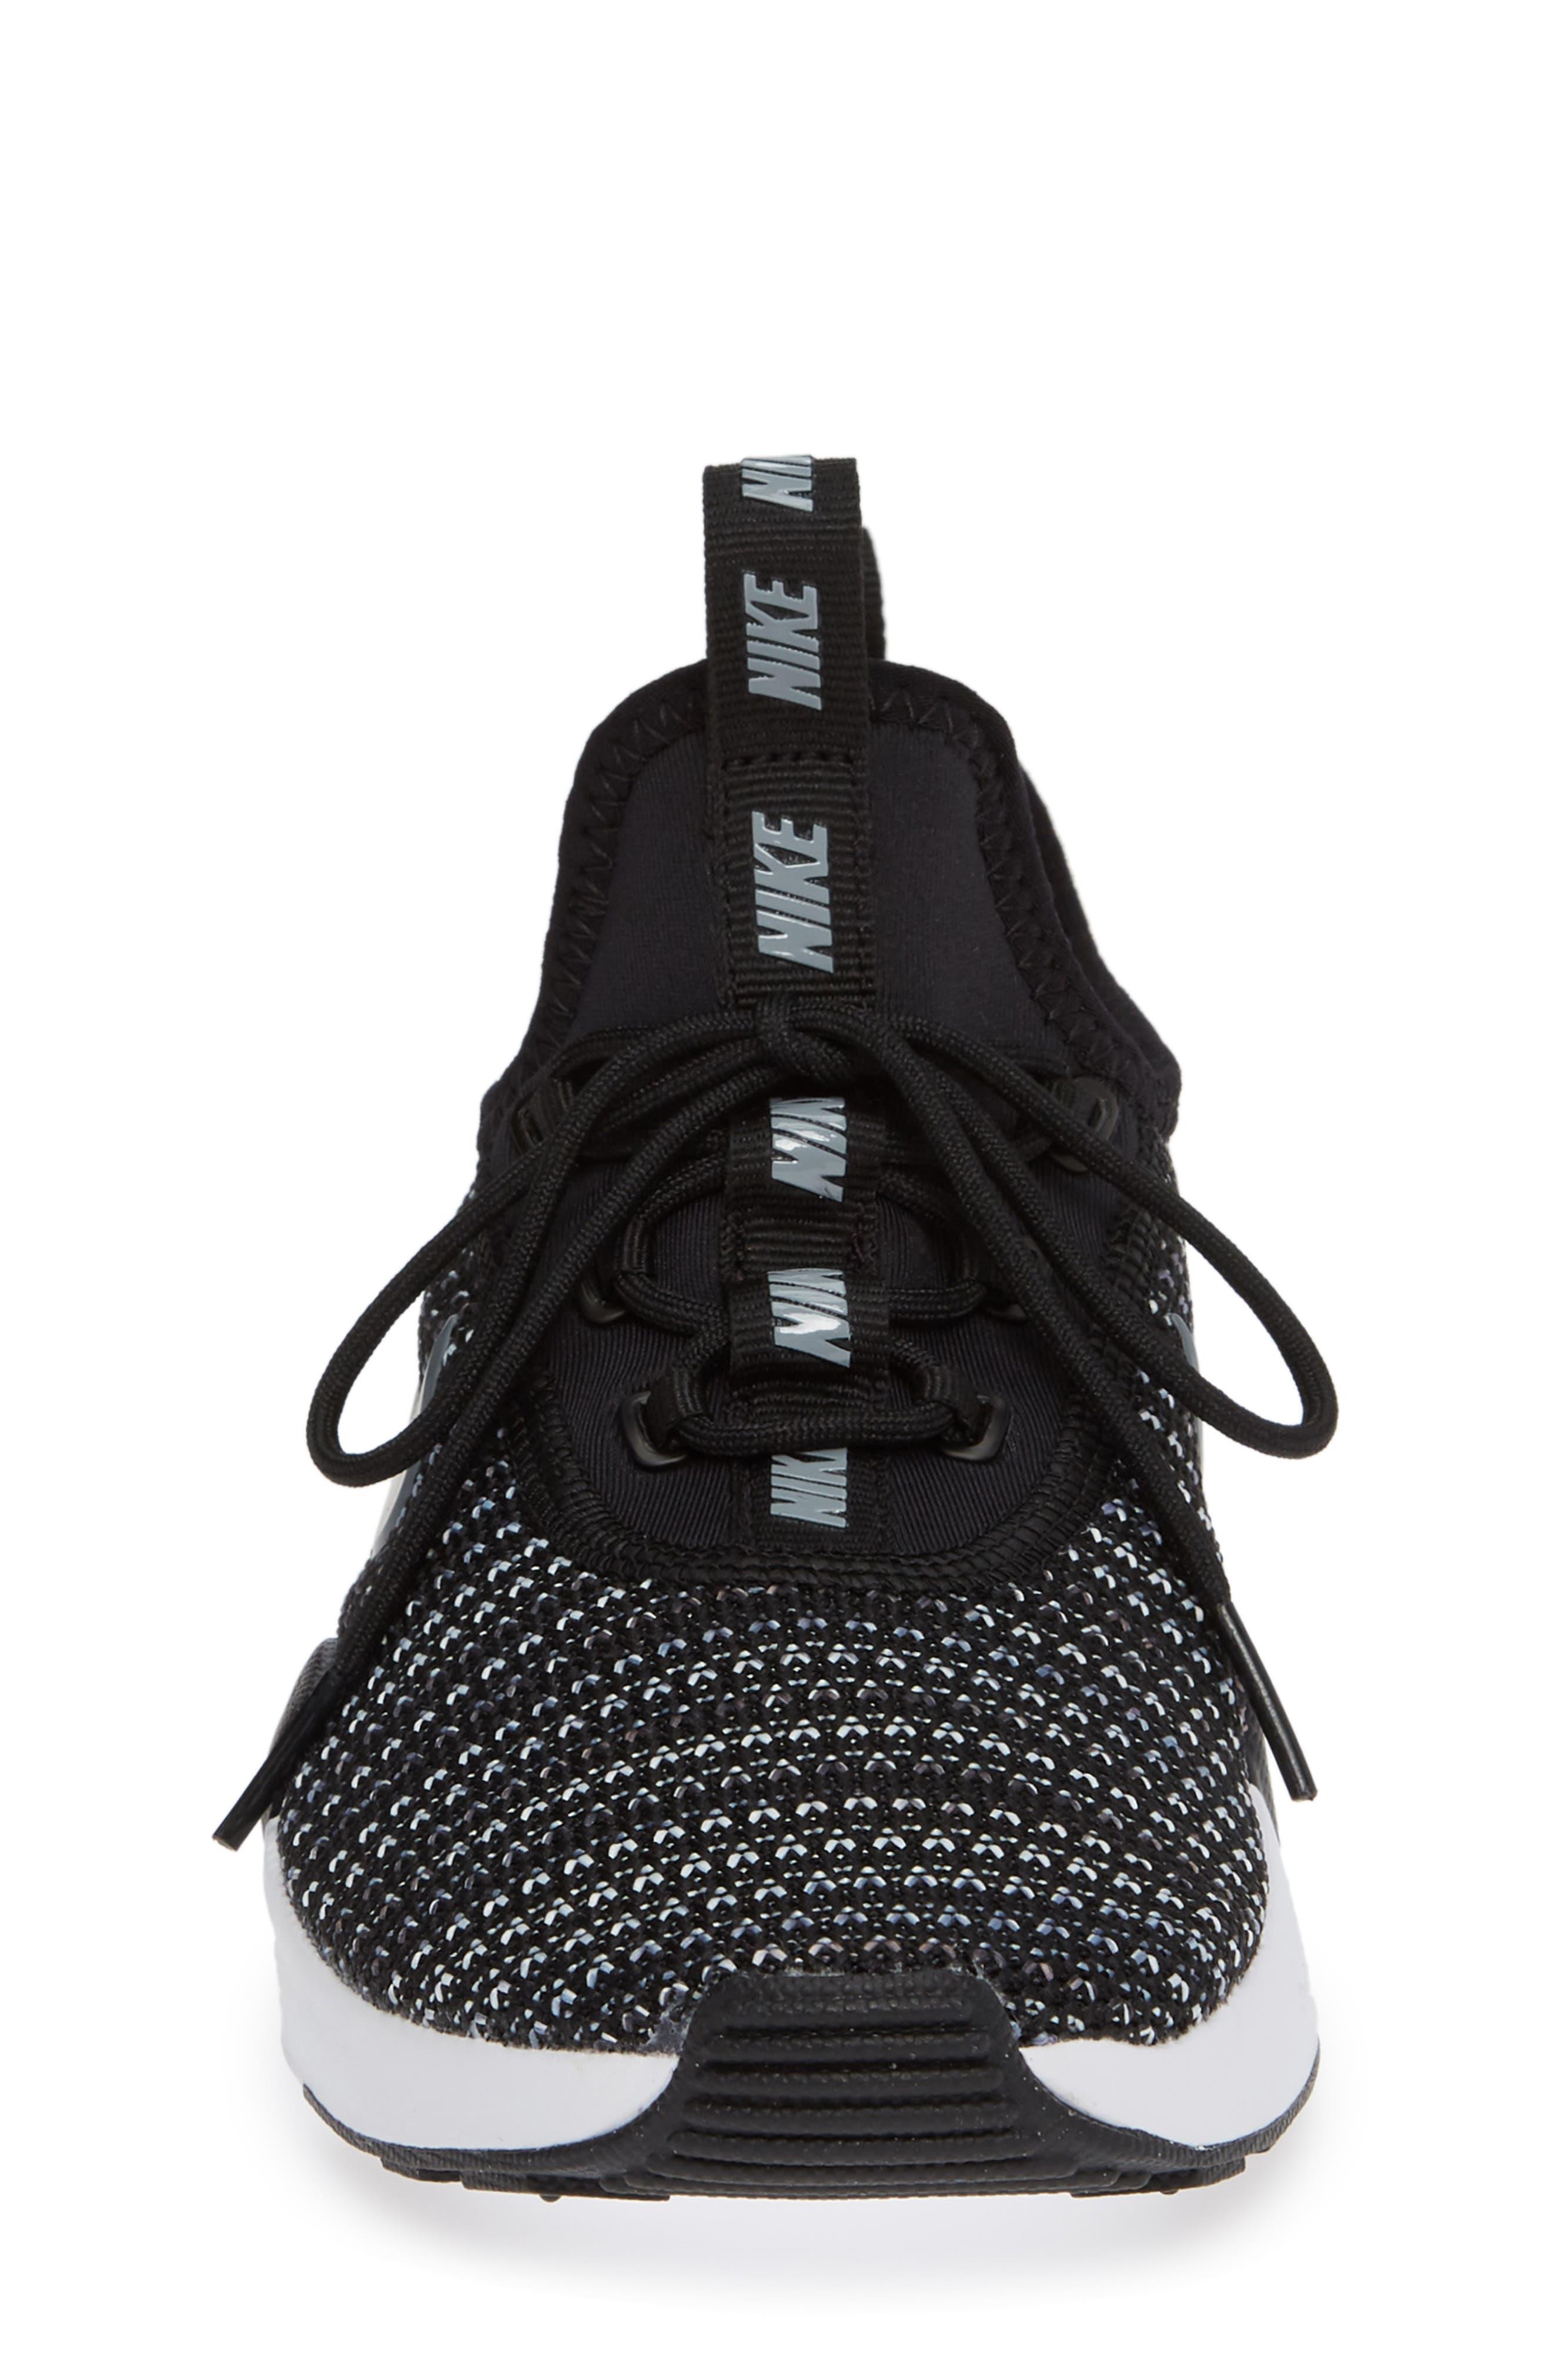 Ashin Modern Sock Knit Sneaker,                             Alternate thumbnail 6, color,                             Black/ Cool Grey/ Anthracite